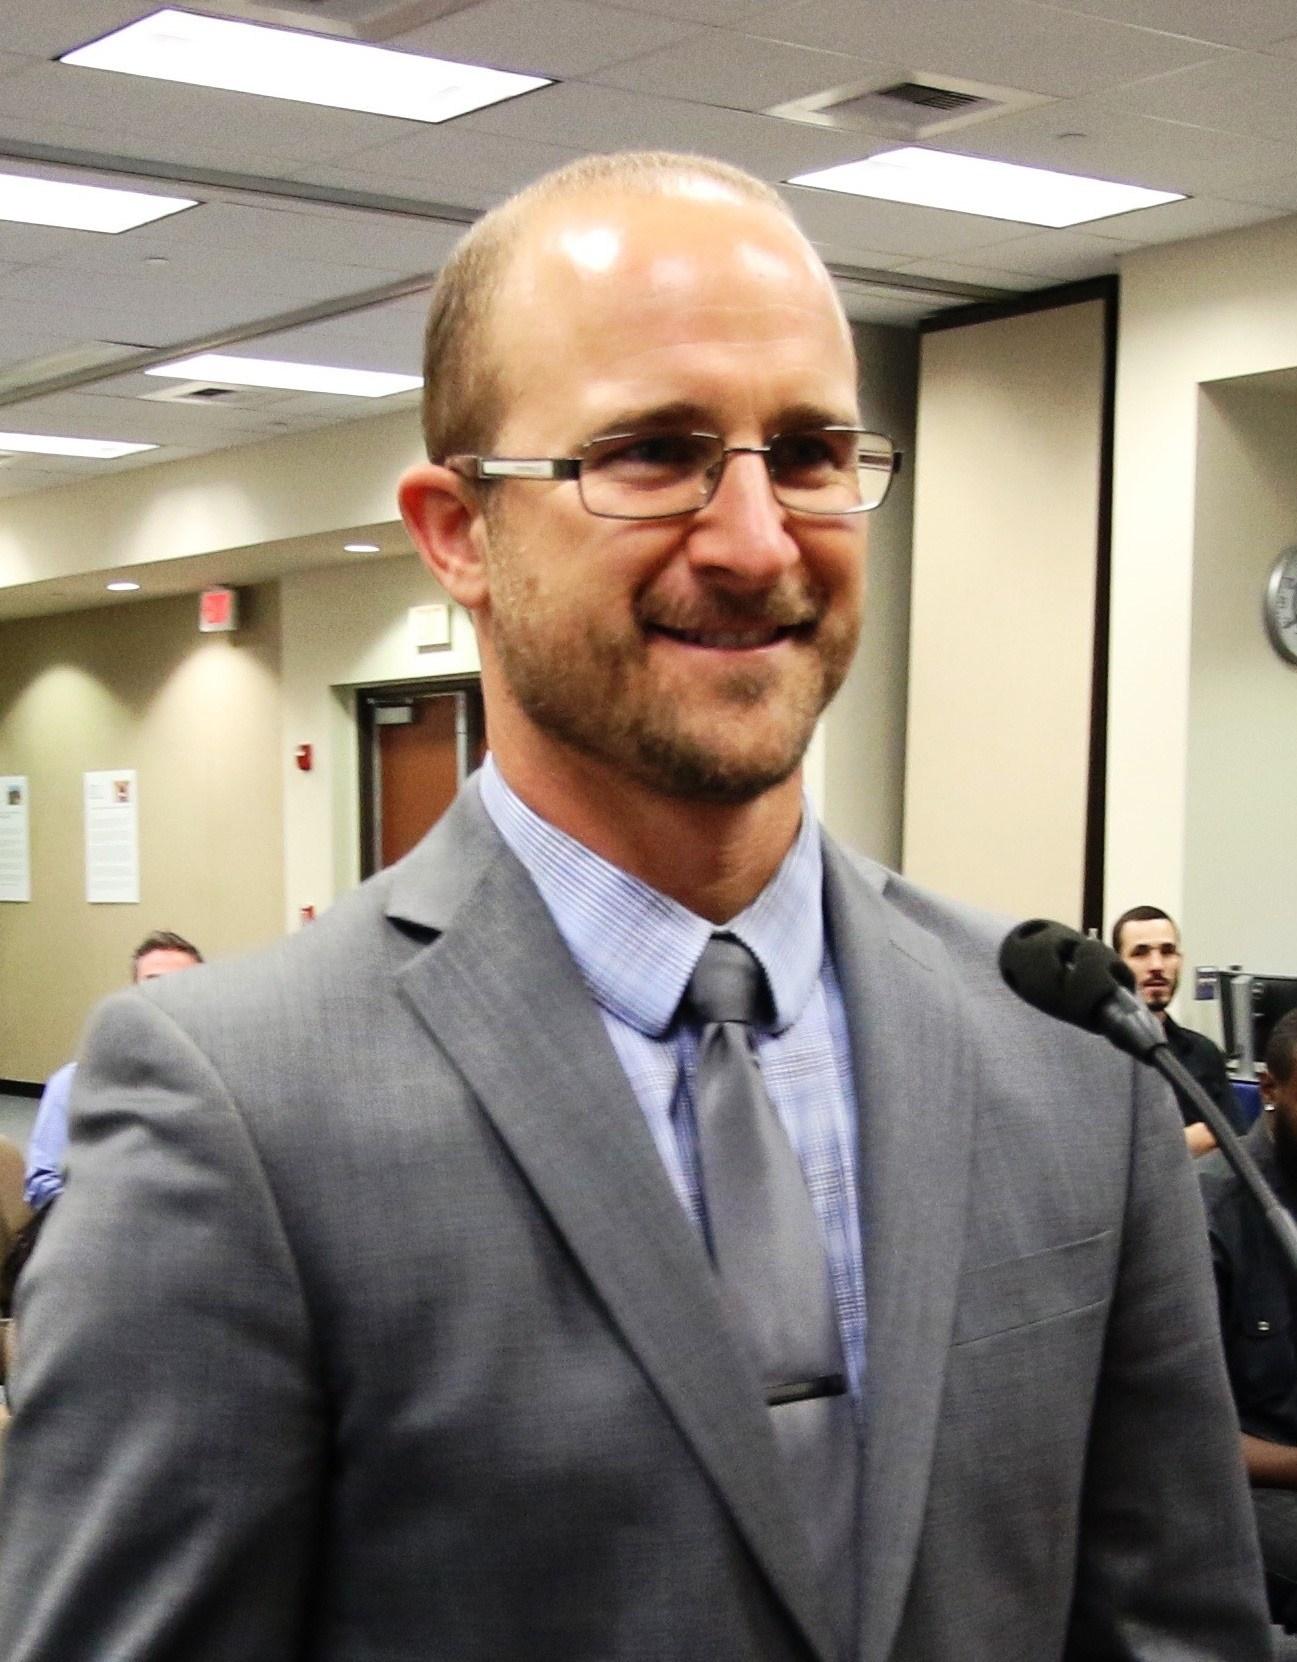 Principal, Daniel Betts